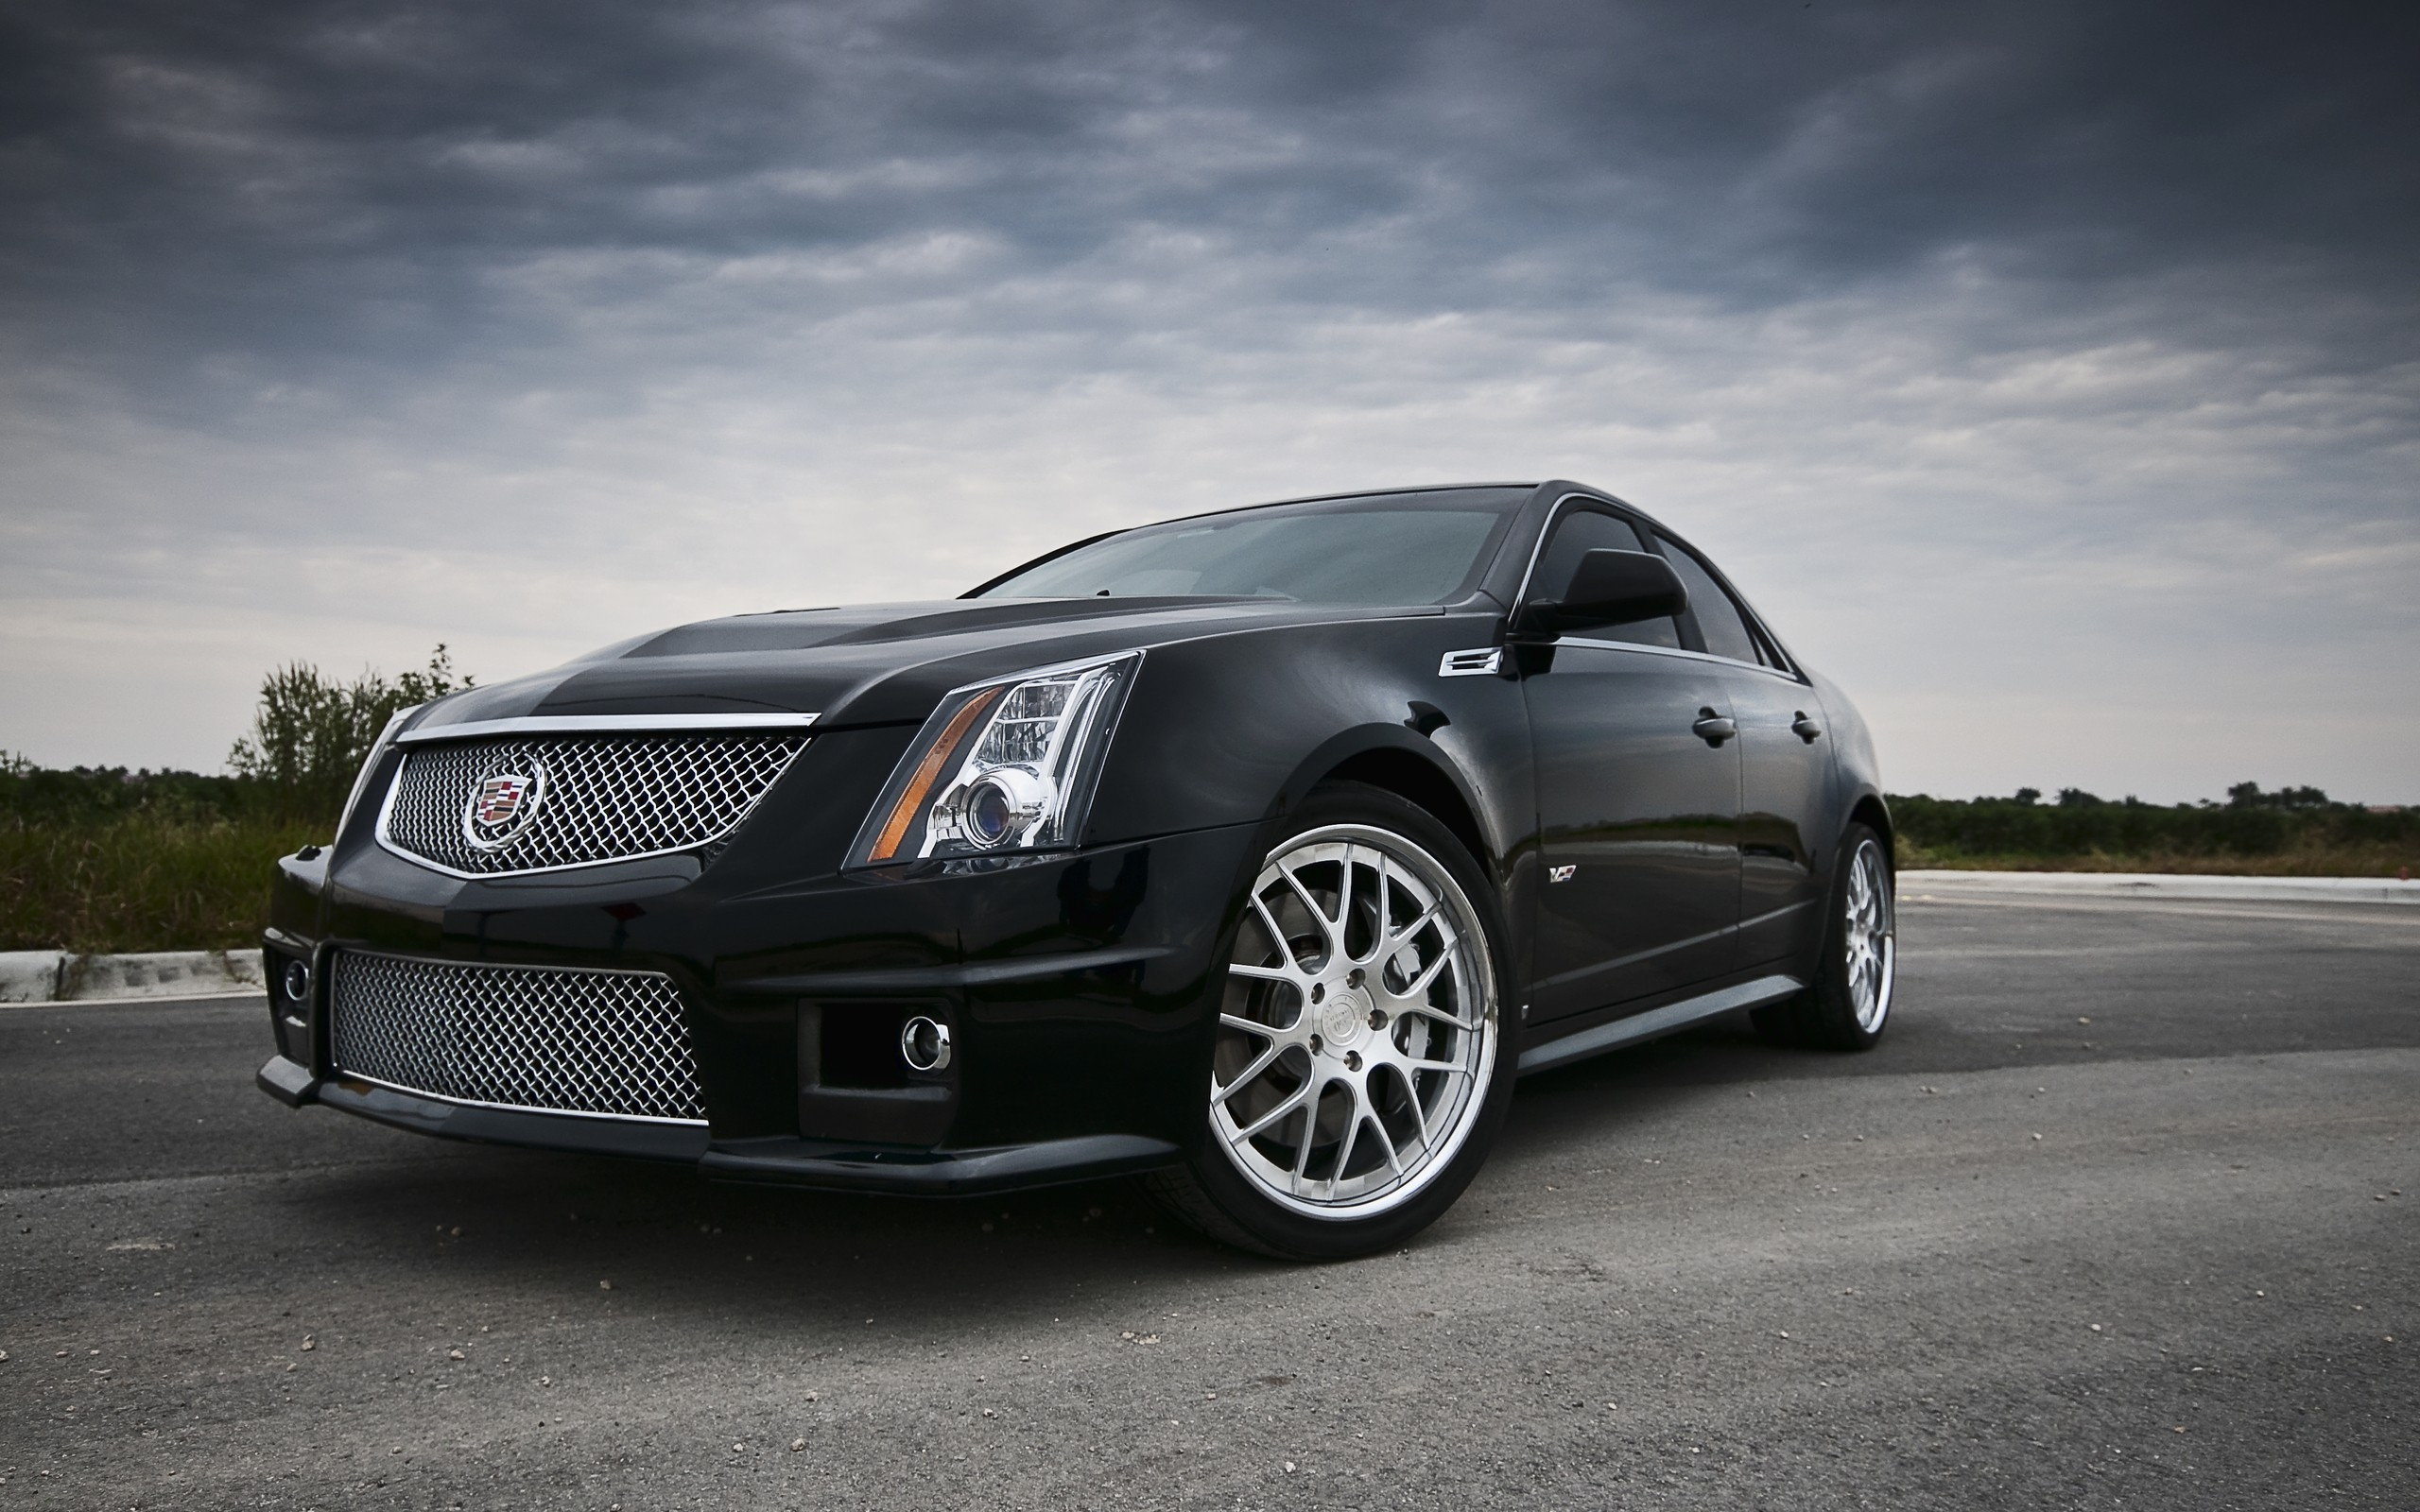 supercars tuning wheels racing sports cars luxury sport cars Cadillac 2560x1600